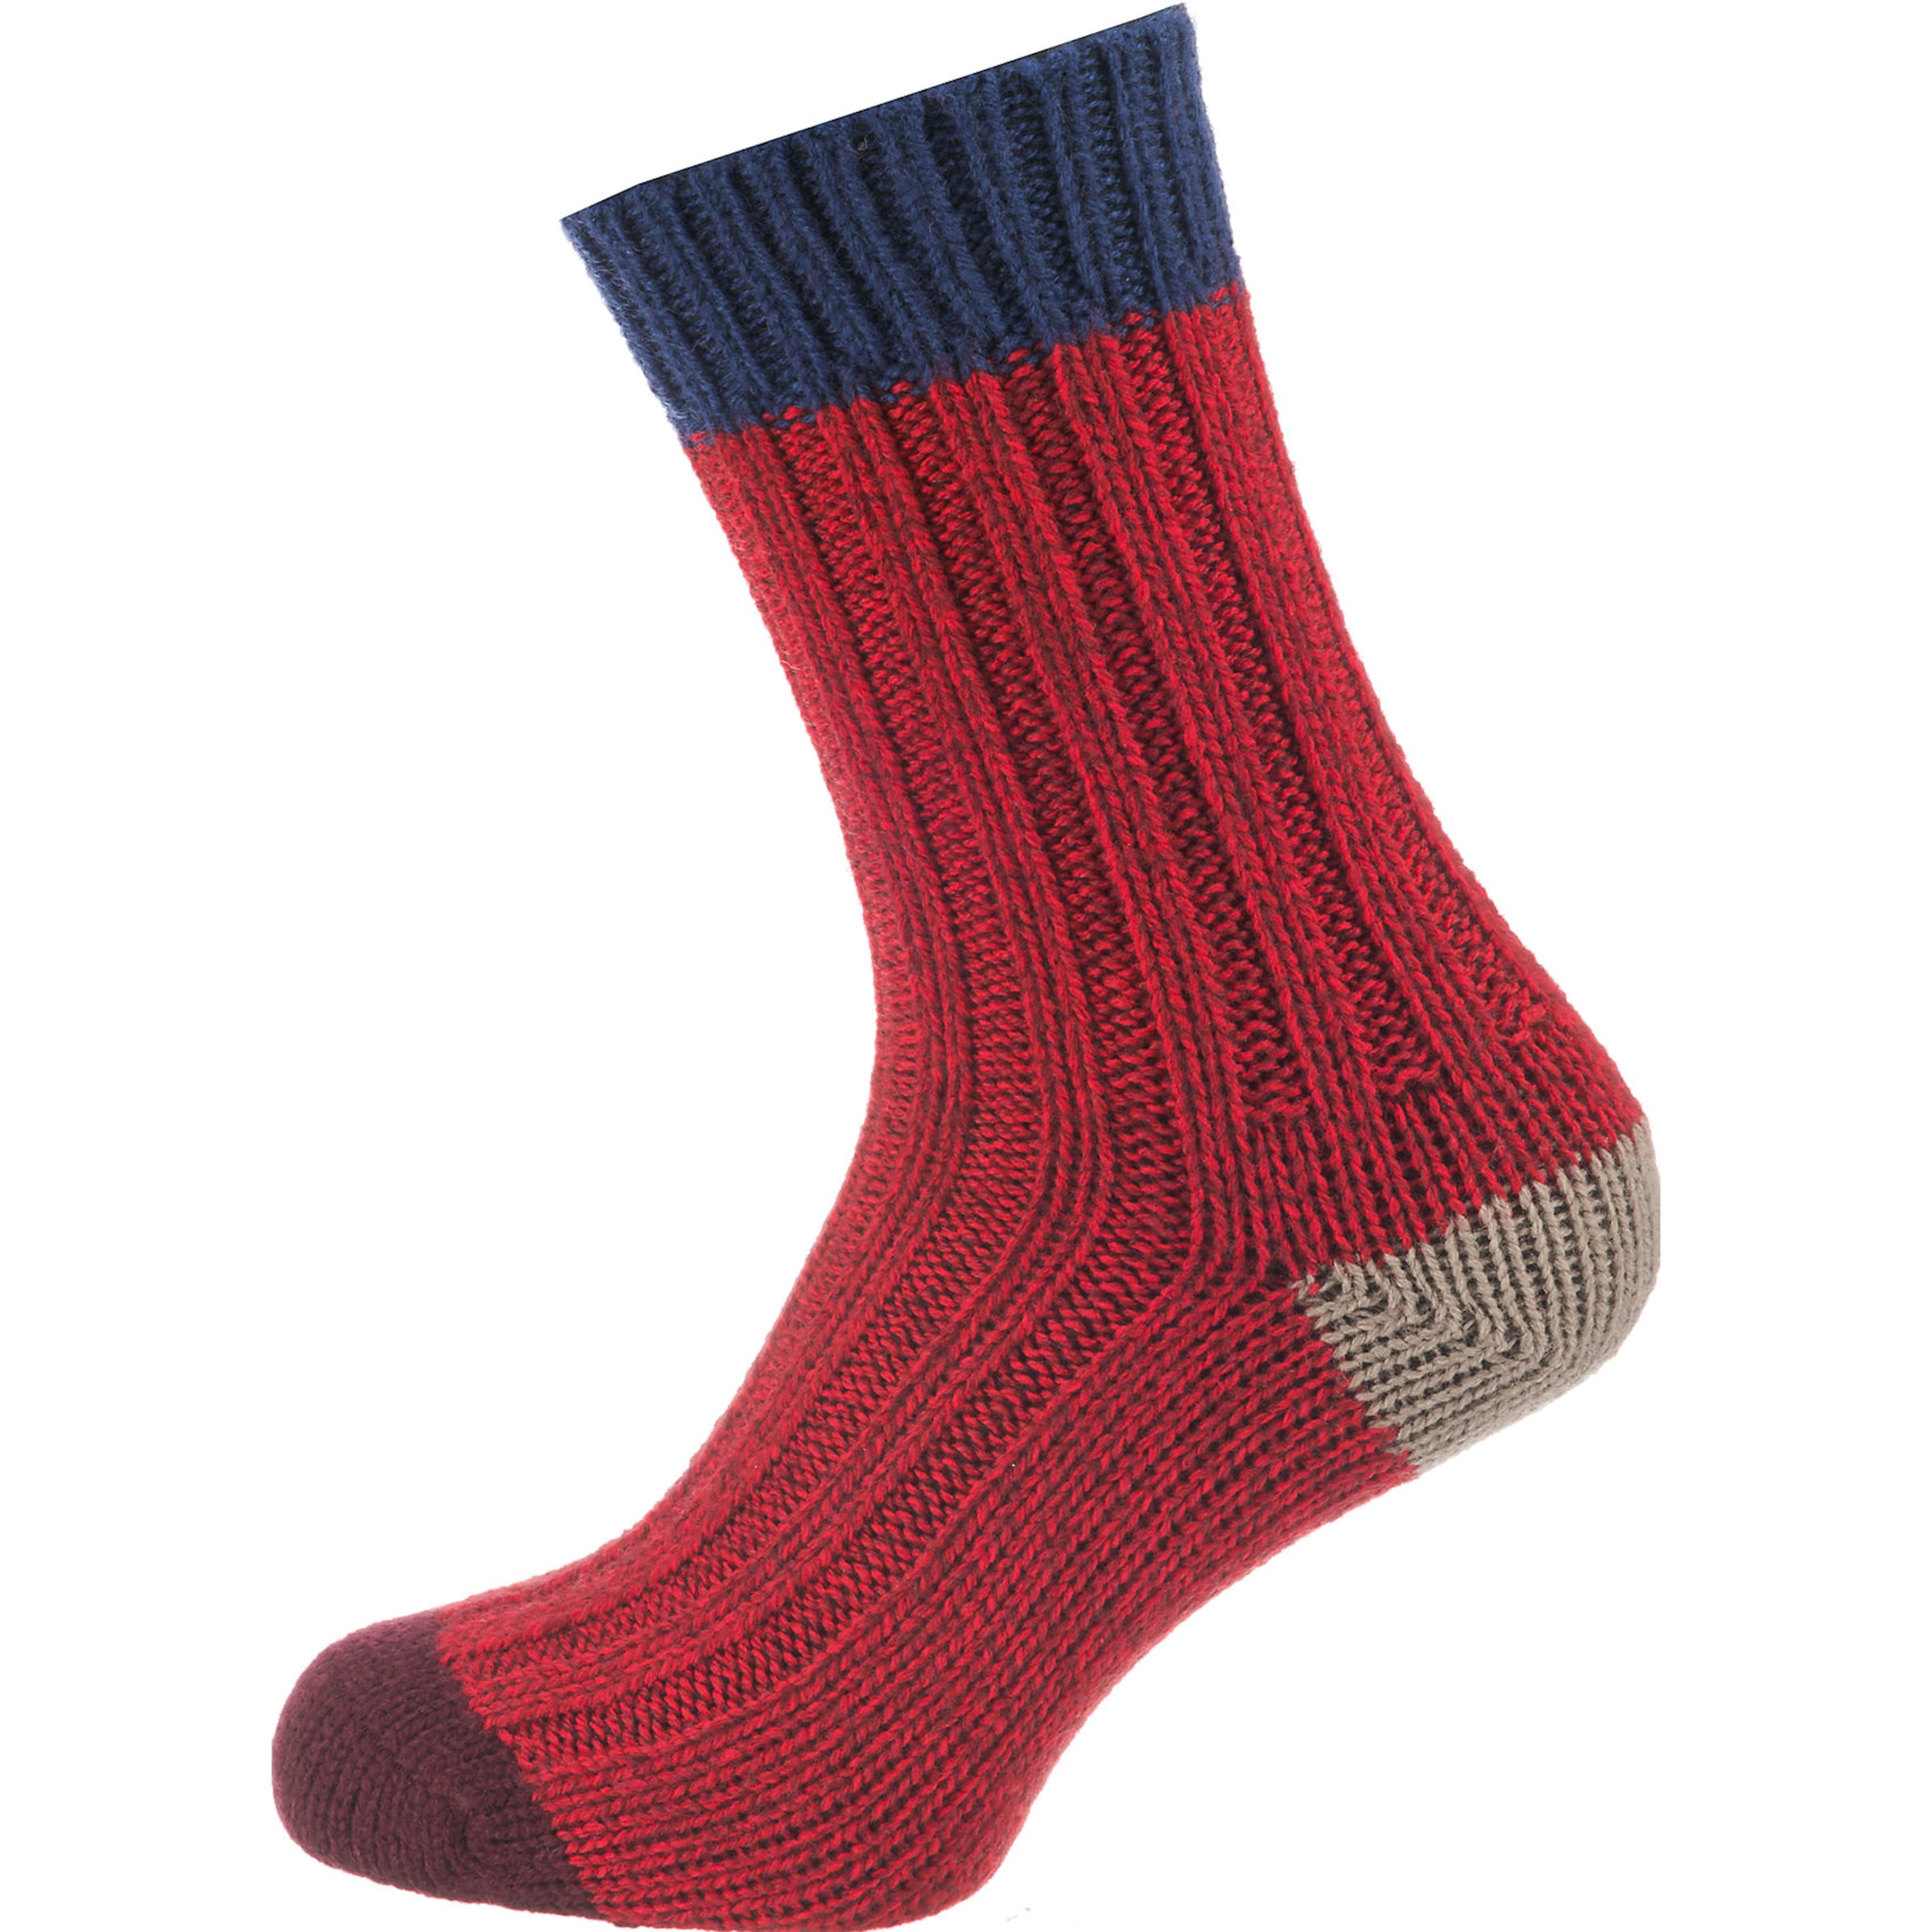 BeigeNachtblau Rot Socken oliver In S fv6bgY7y